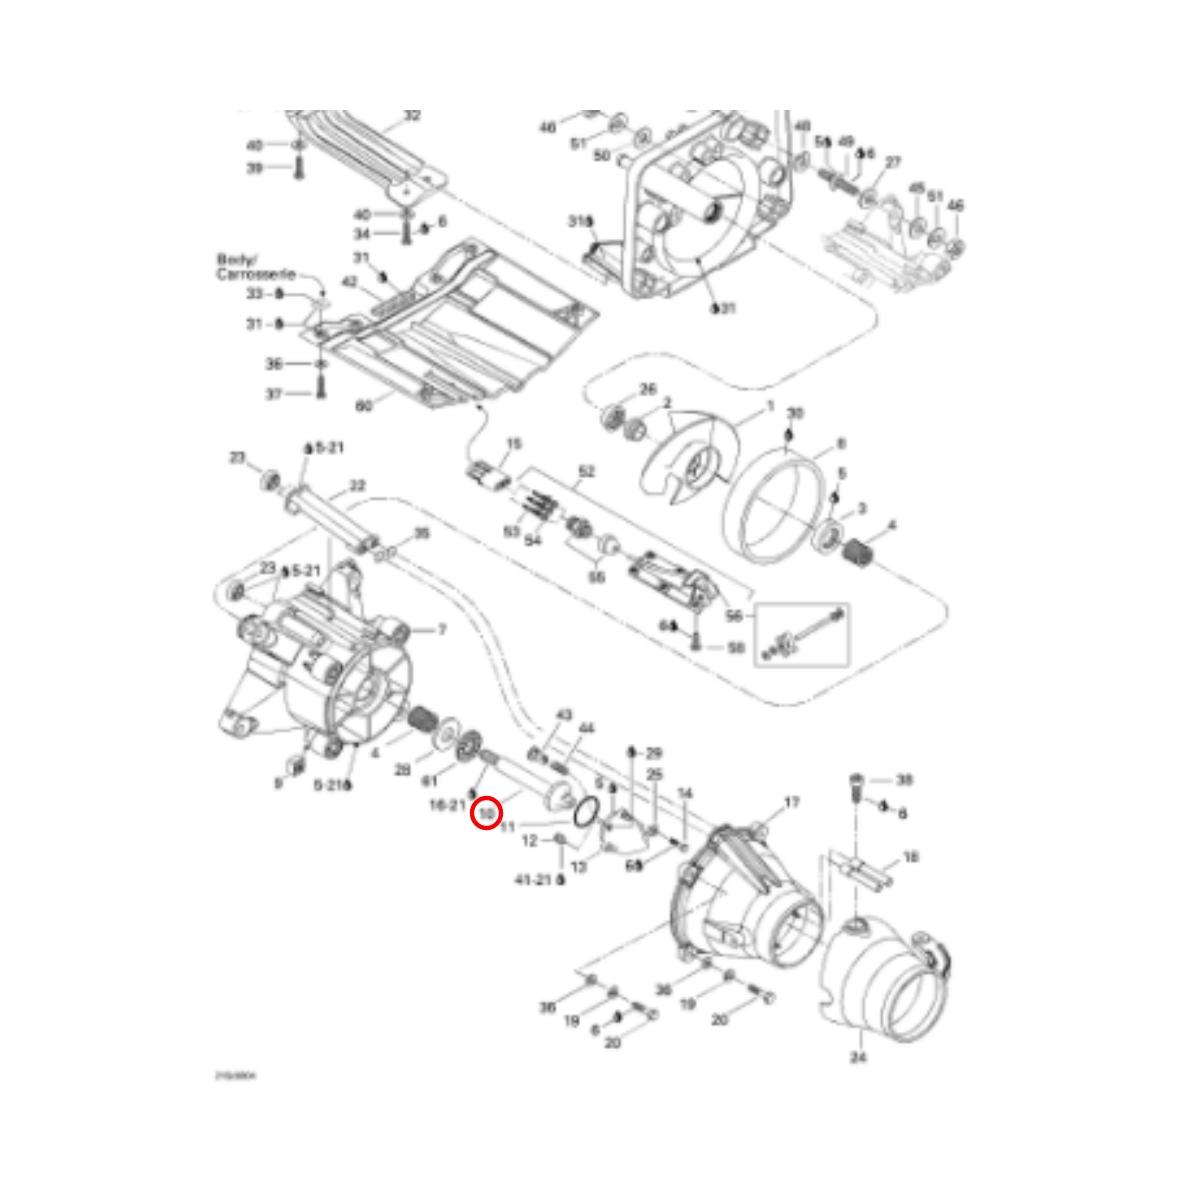 Eixo Turbina para Jet Ski Sea Doo 800 e GSXLTD 98  - Radical Peças - Peças para Jet Ski